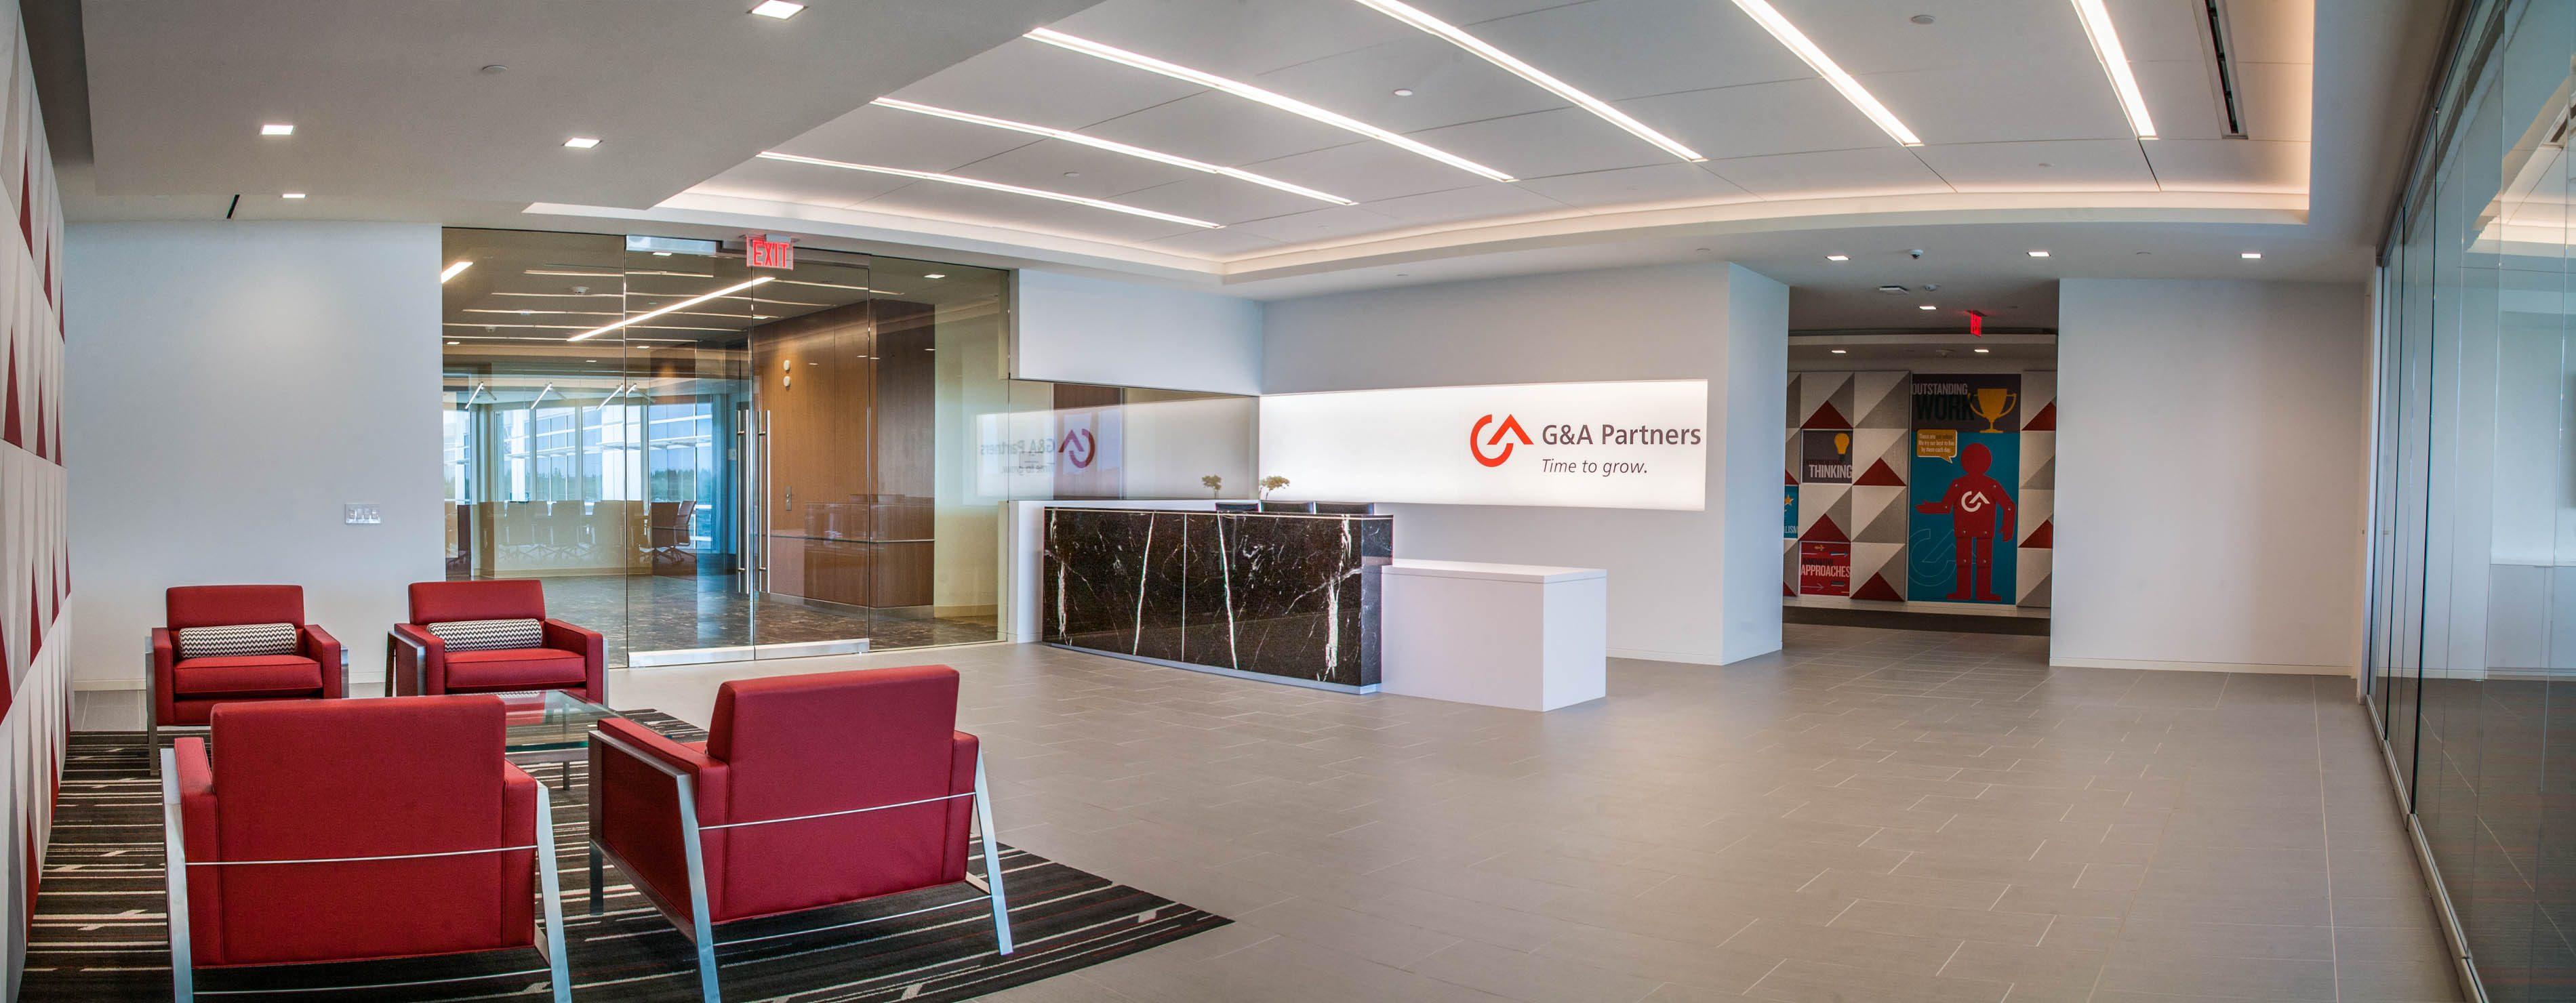 G&A Partners - Austin